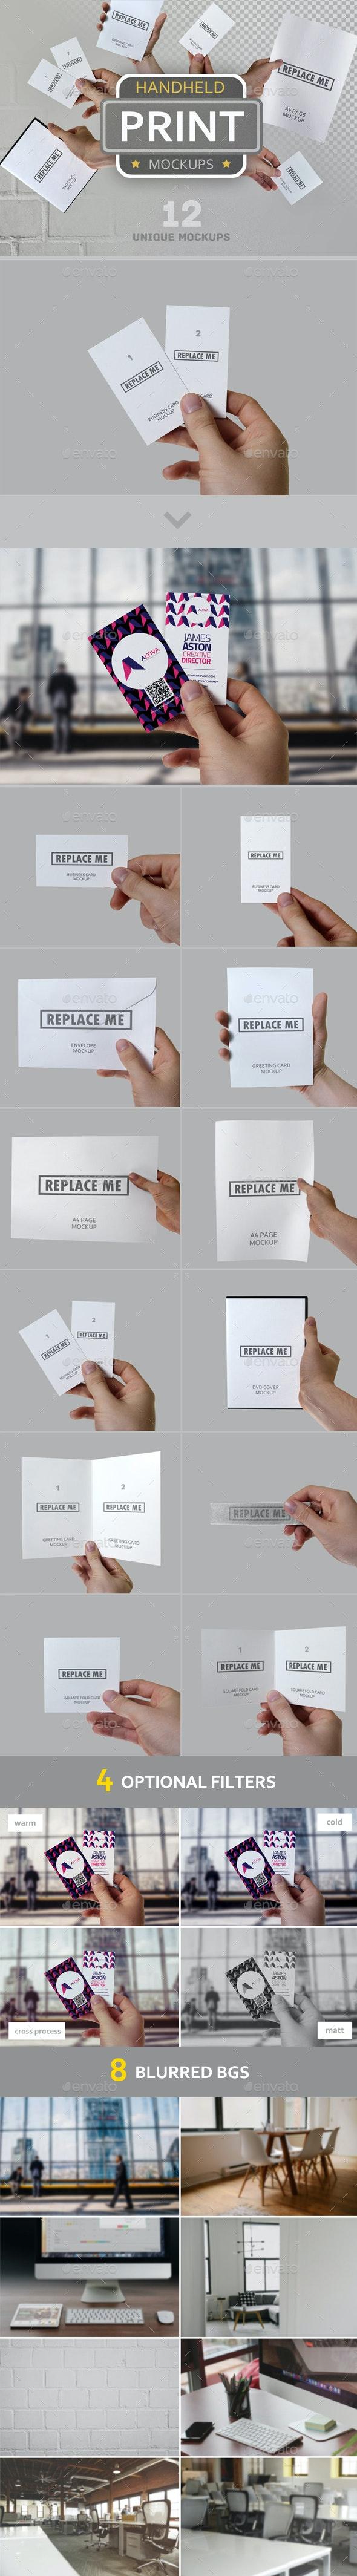 Handheld Print Mockups - Stationery Print